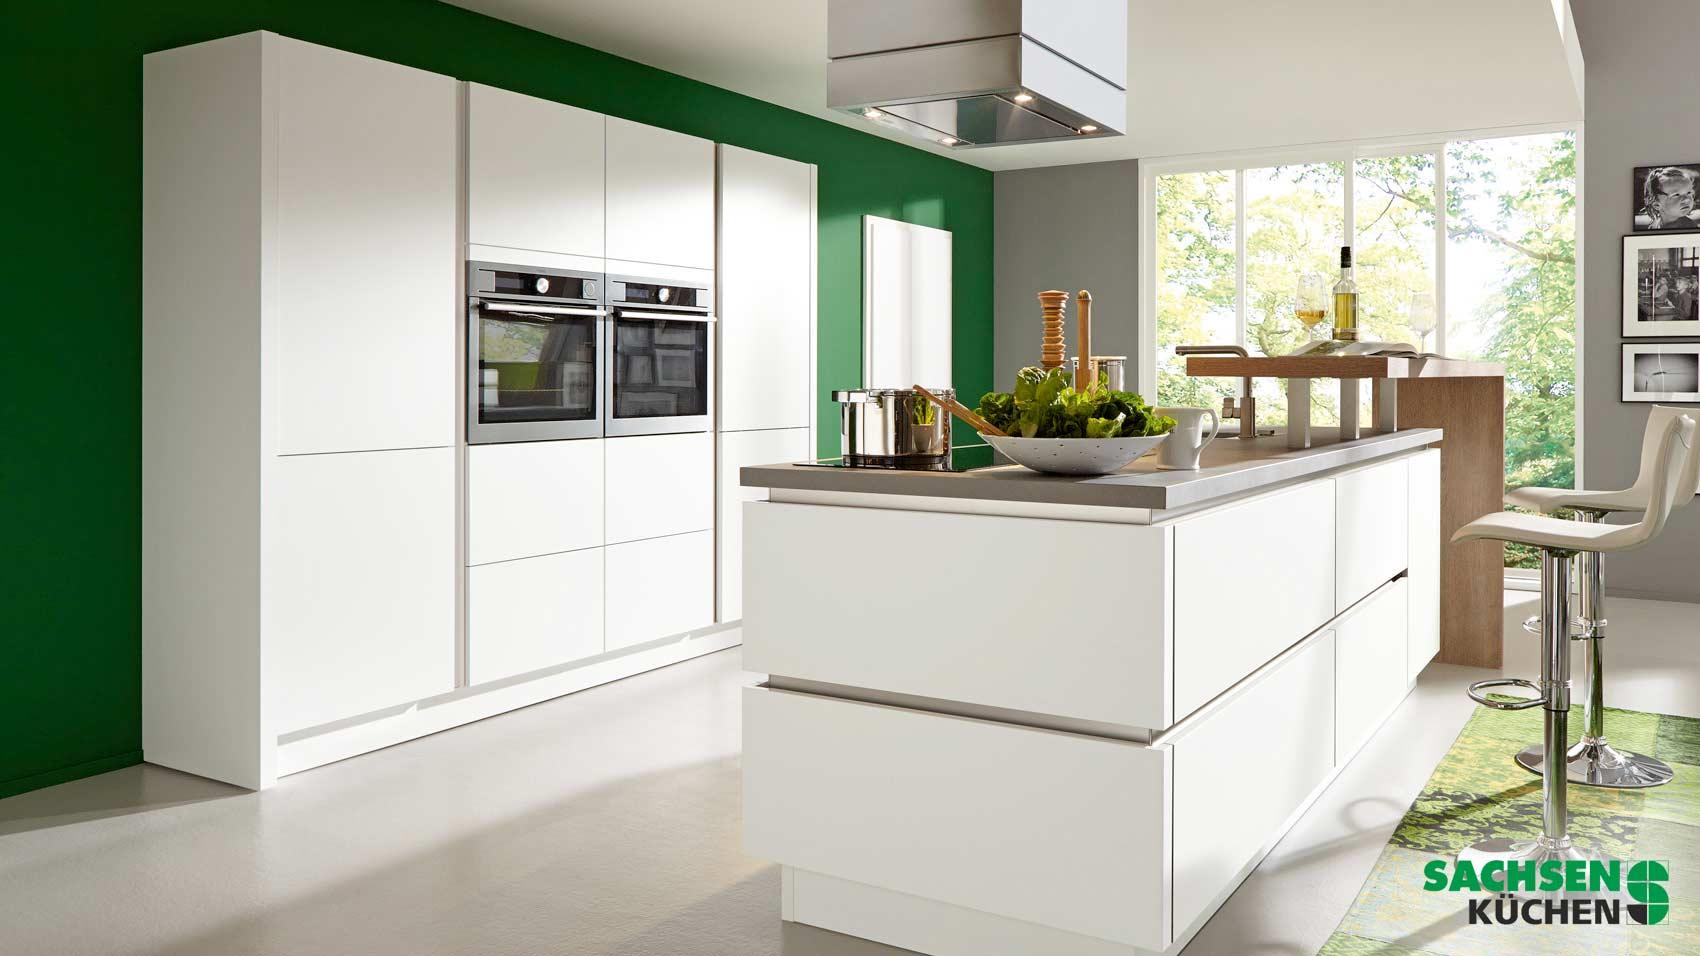 sachsen k chen nahe erfurt weimar jena m bel u k chen by land blankenhain. Black Bedroom Furniture Sets. Home Design Ideas